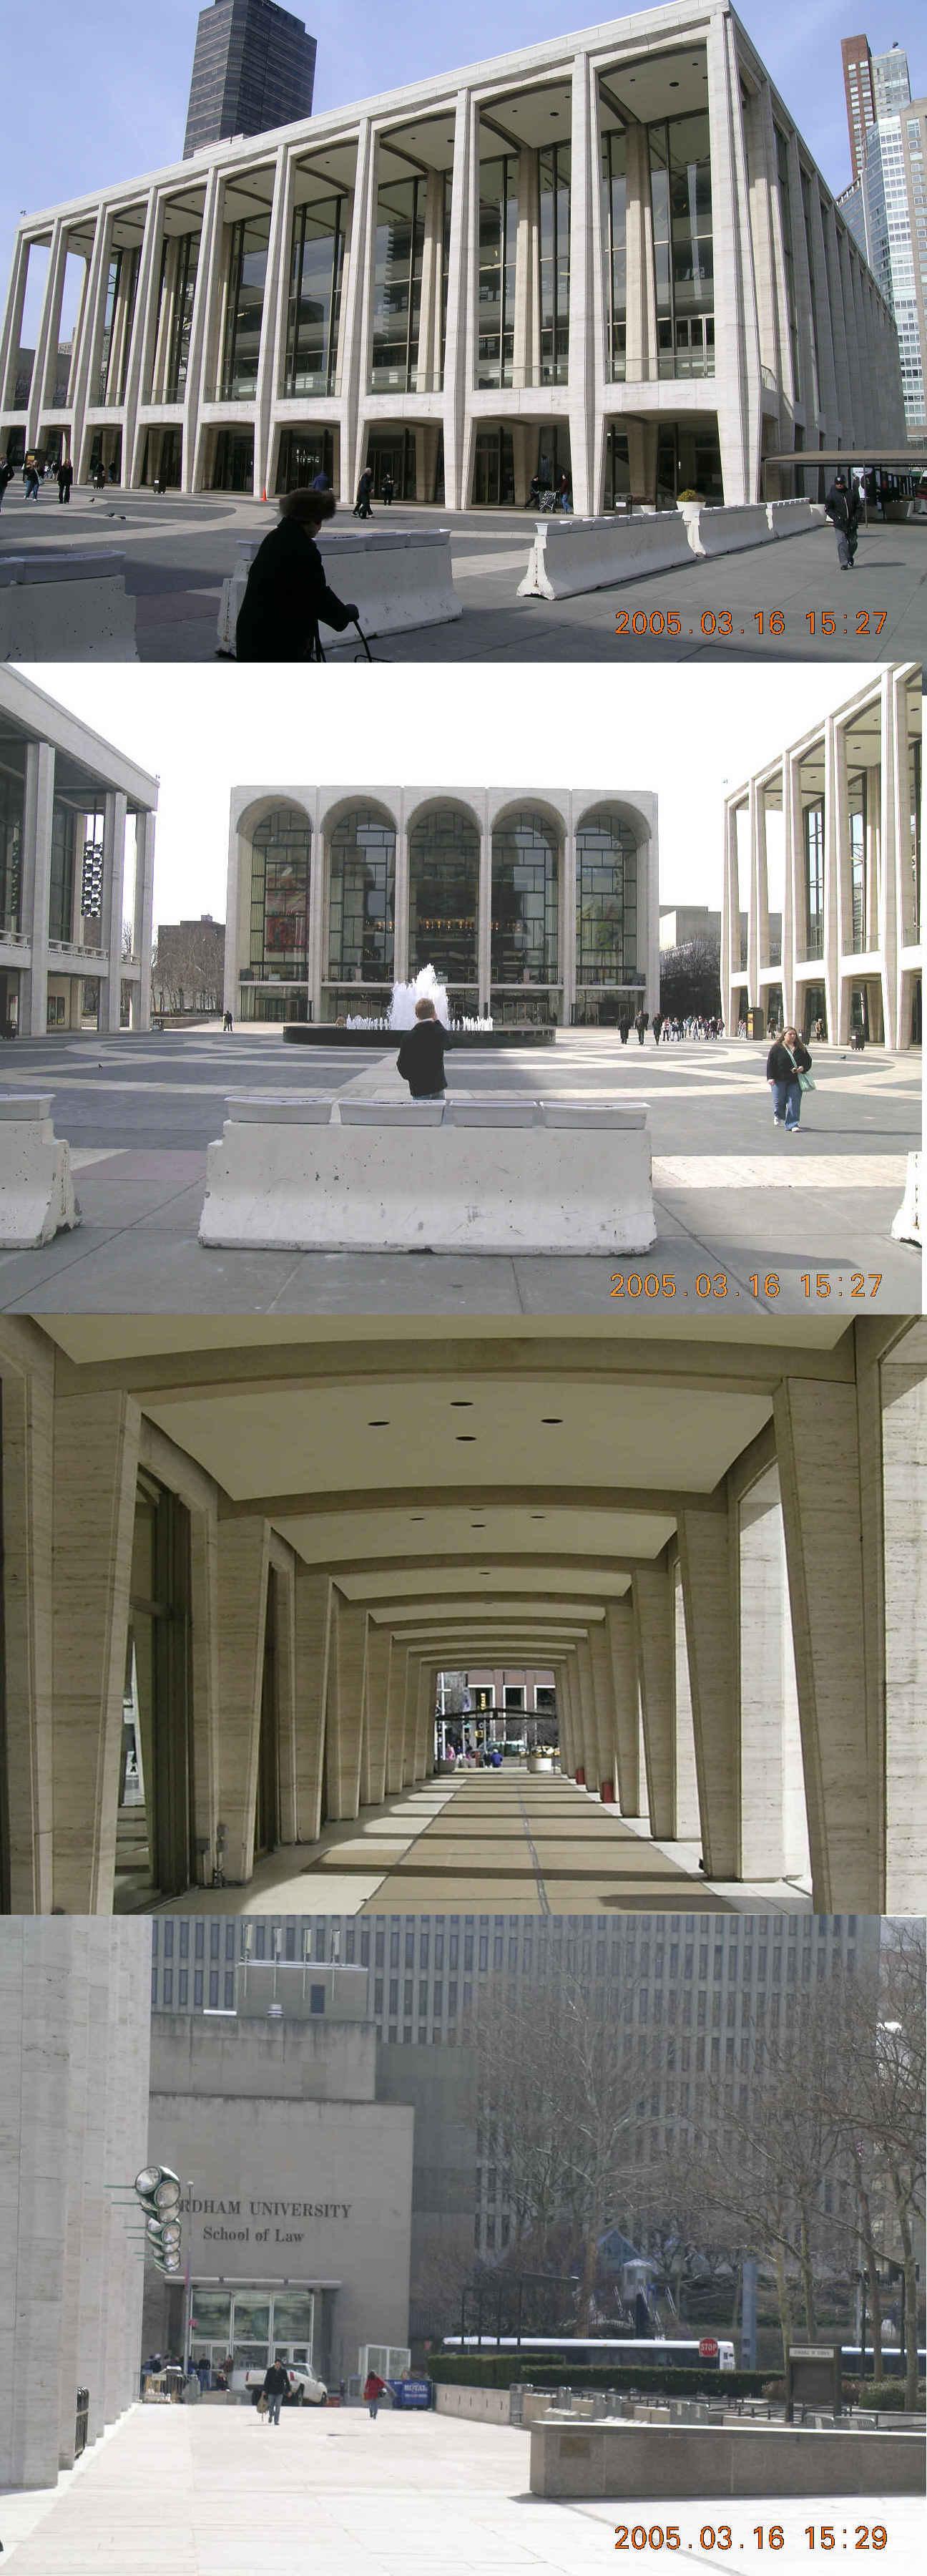 parking full map lot st lincoln center york parkme open garage w in new